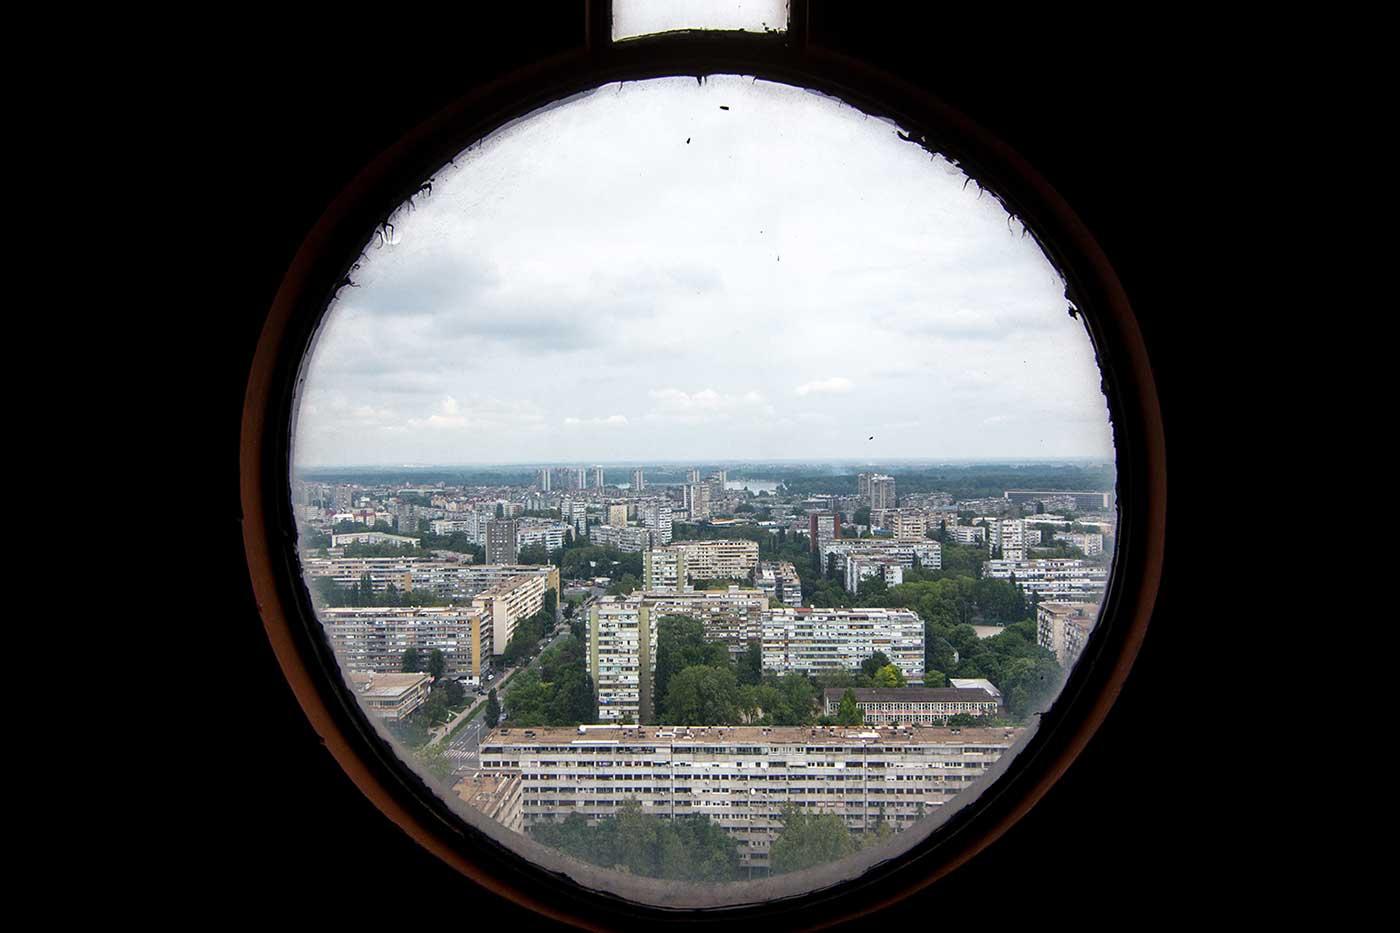 Novi Beograd, Serbia, as seen through the 30th floor porthole of the Western City Gate.